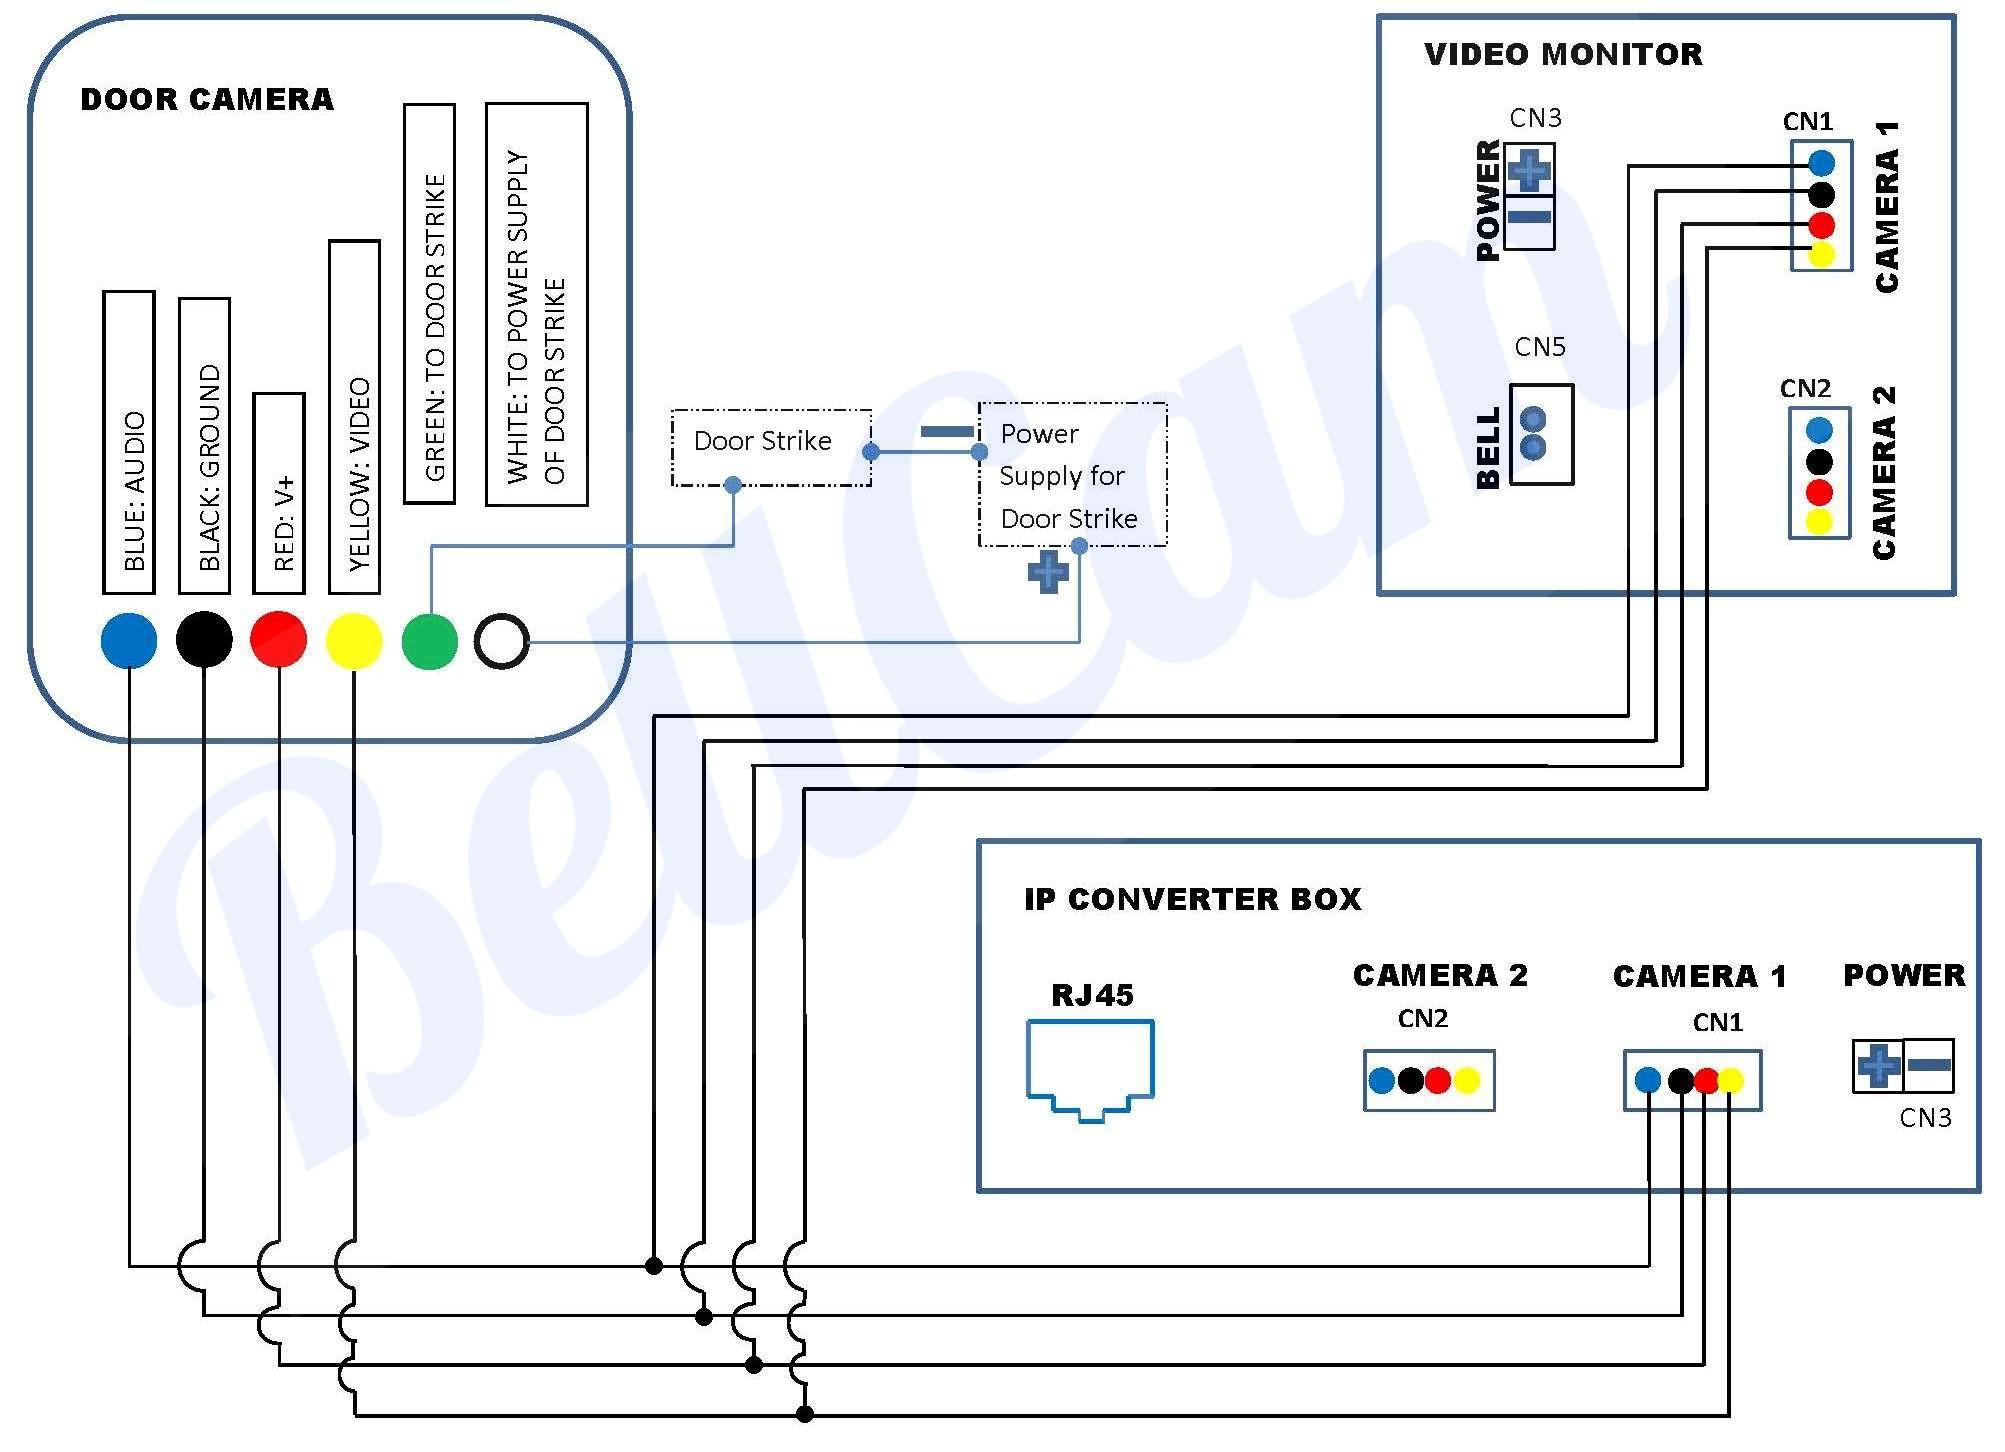 Bunker Hill Color Security Camera 95914 Wire Cololr Code Surveillance Camera Wire Color Diagram Wiring Diagram Of Bunker Hill Color Security Camera 95914 Wire Cololr Code